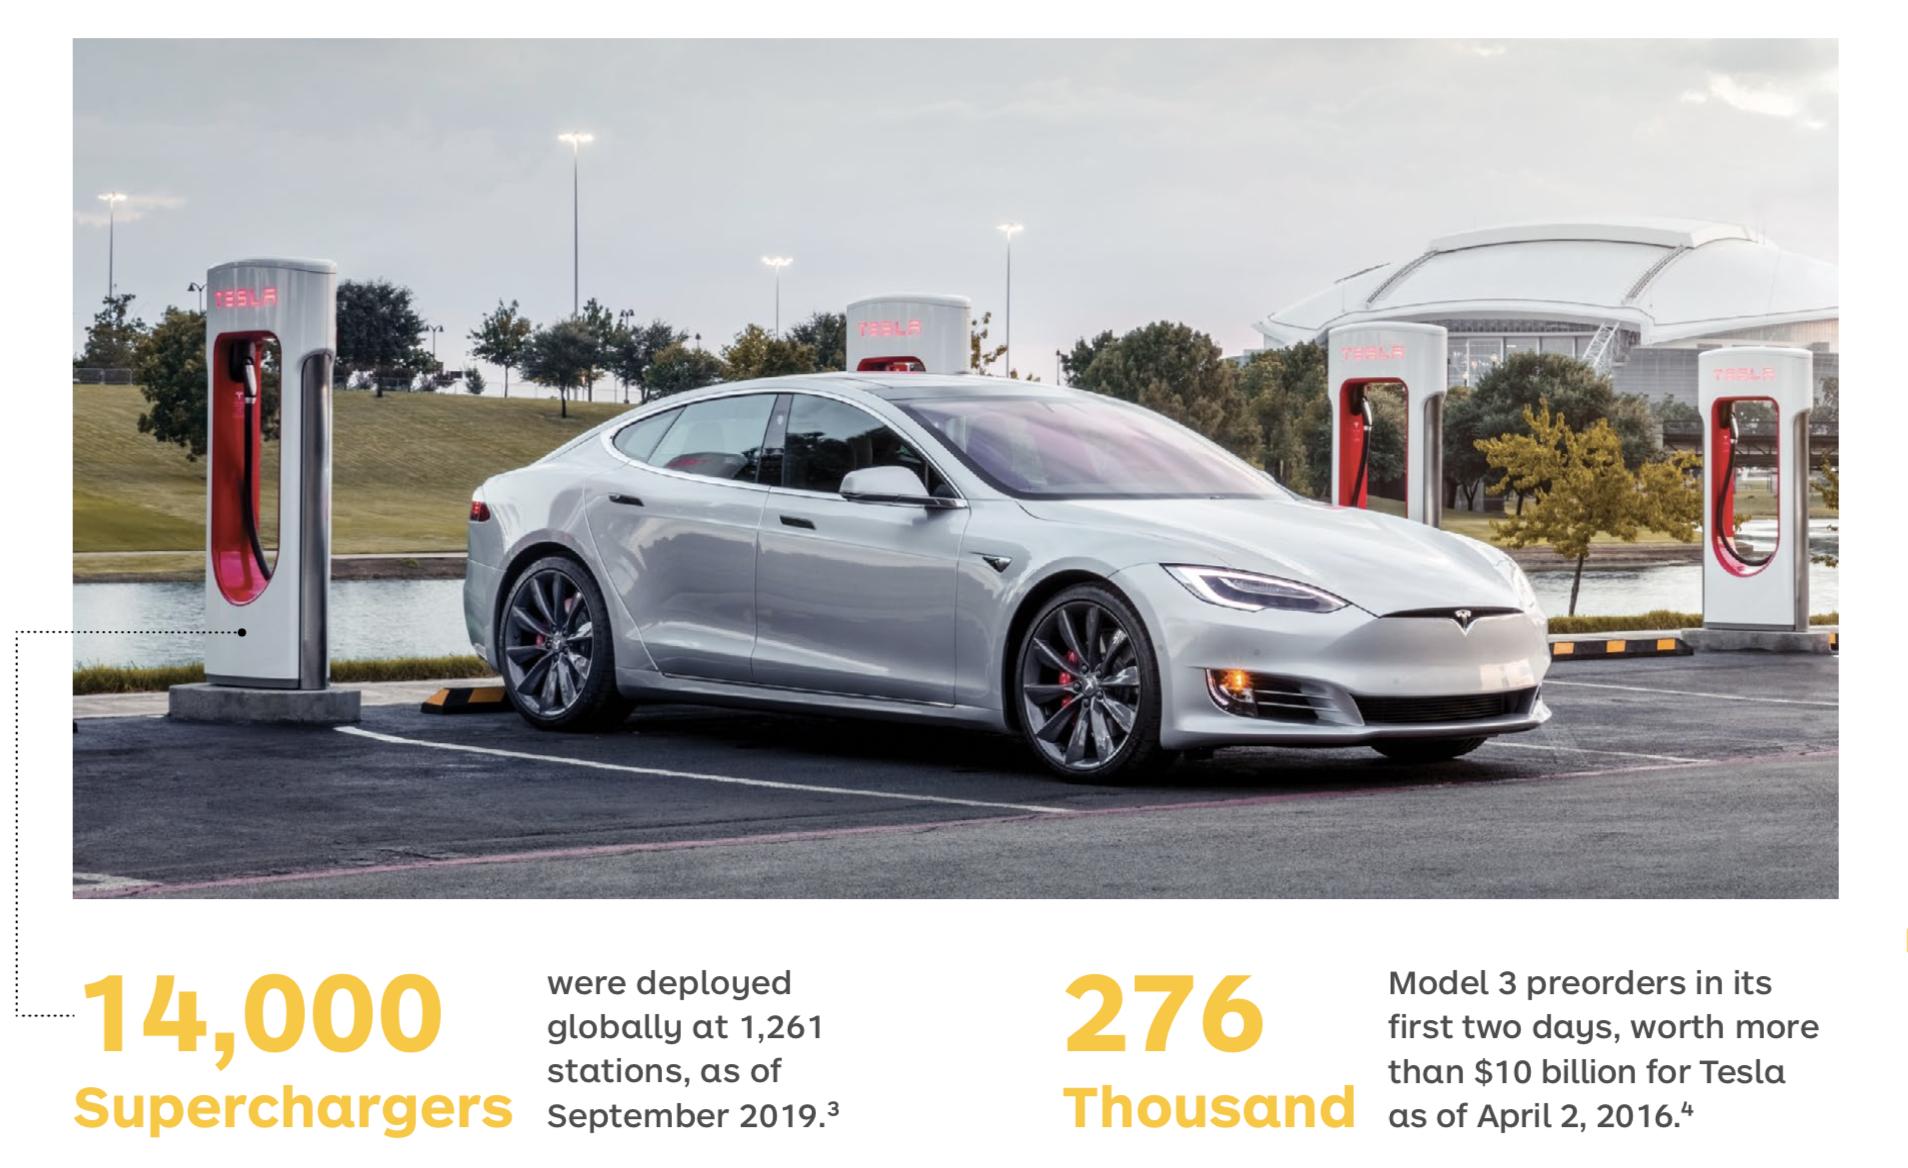 Tesla Fun Facts 1